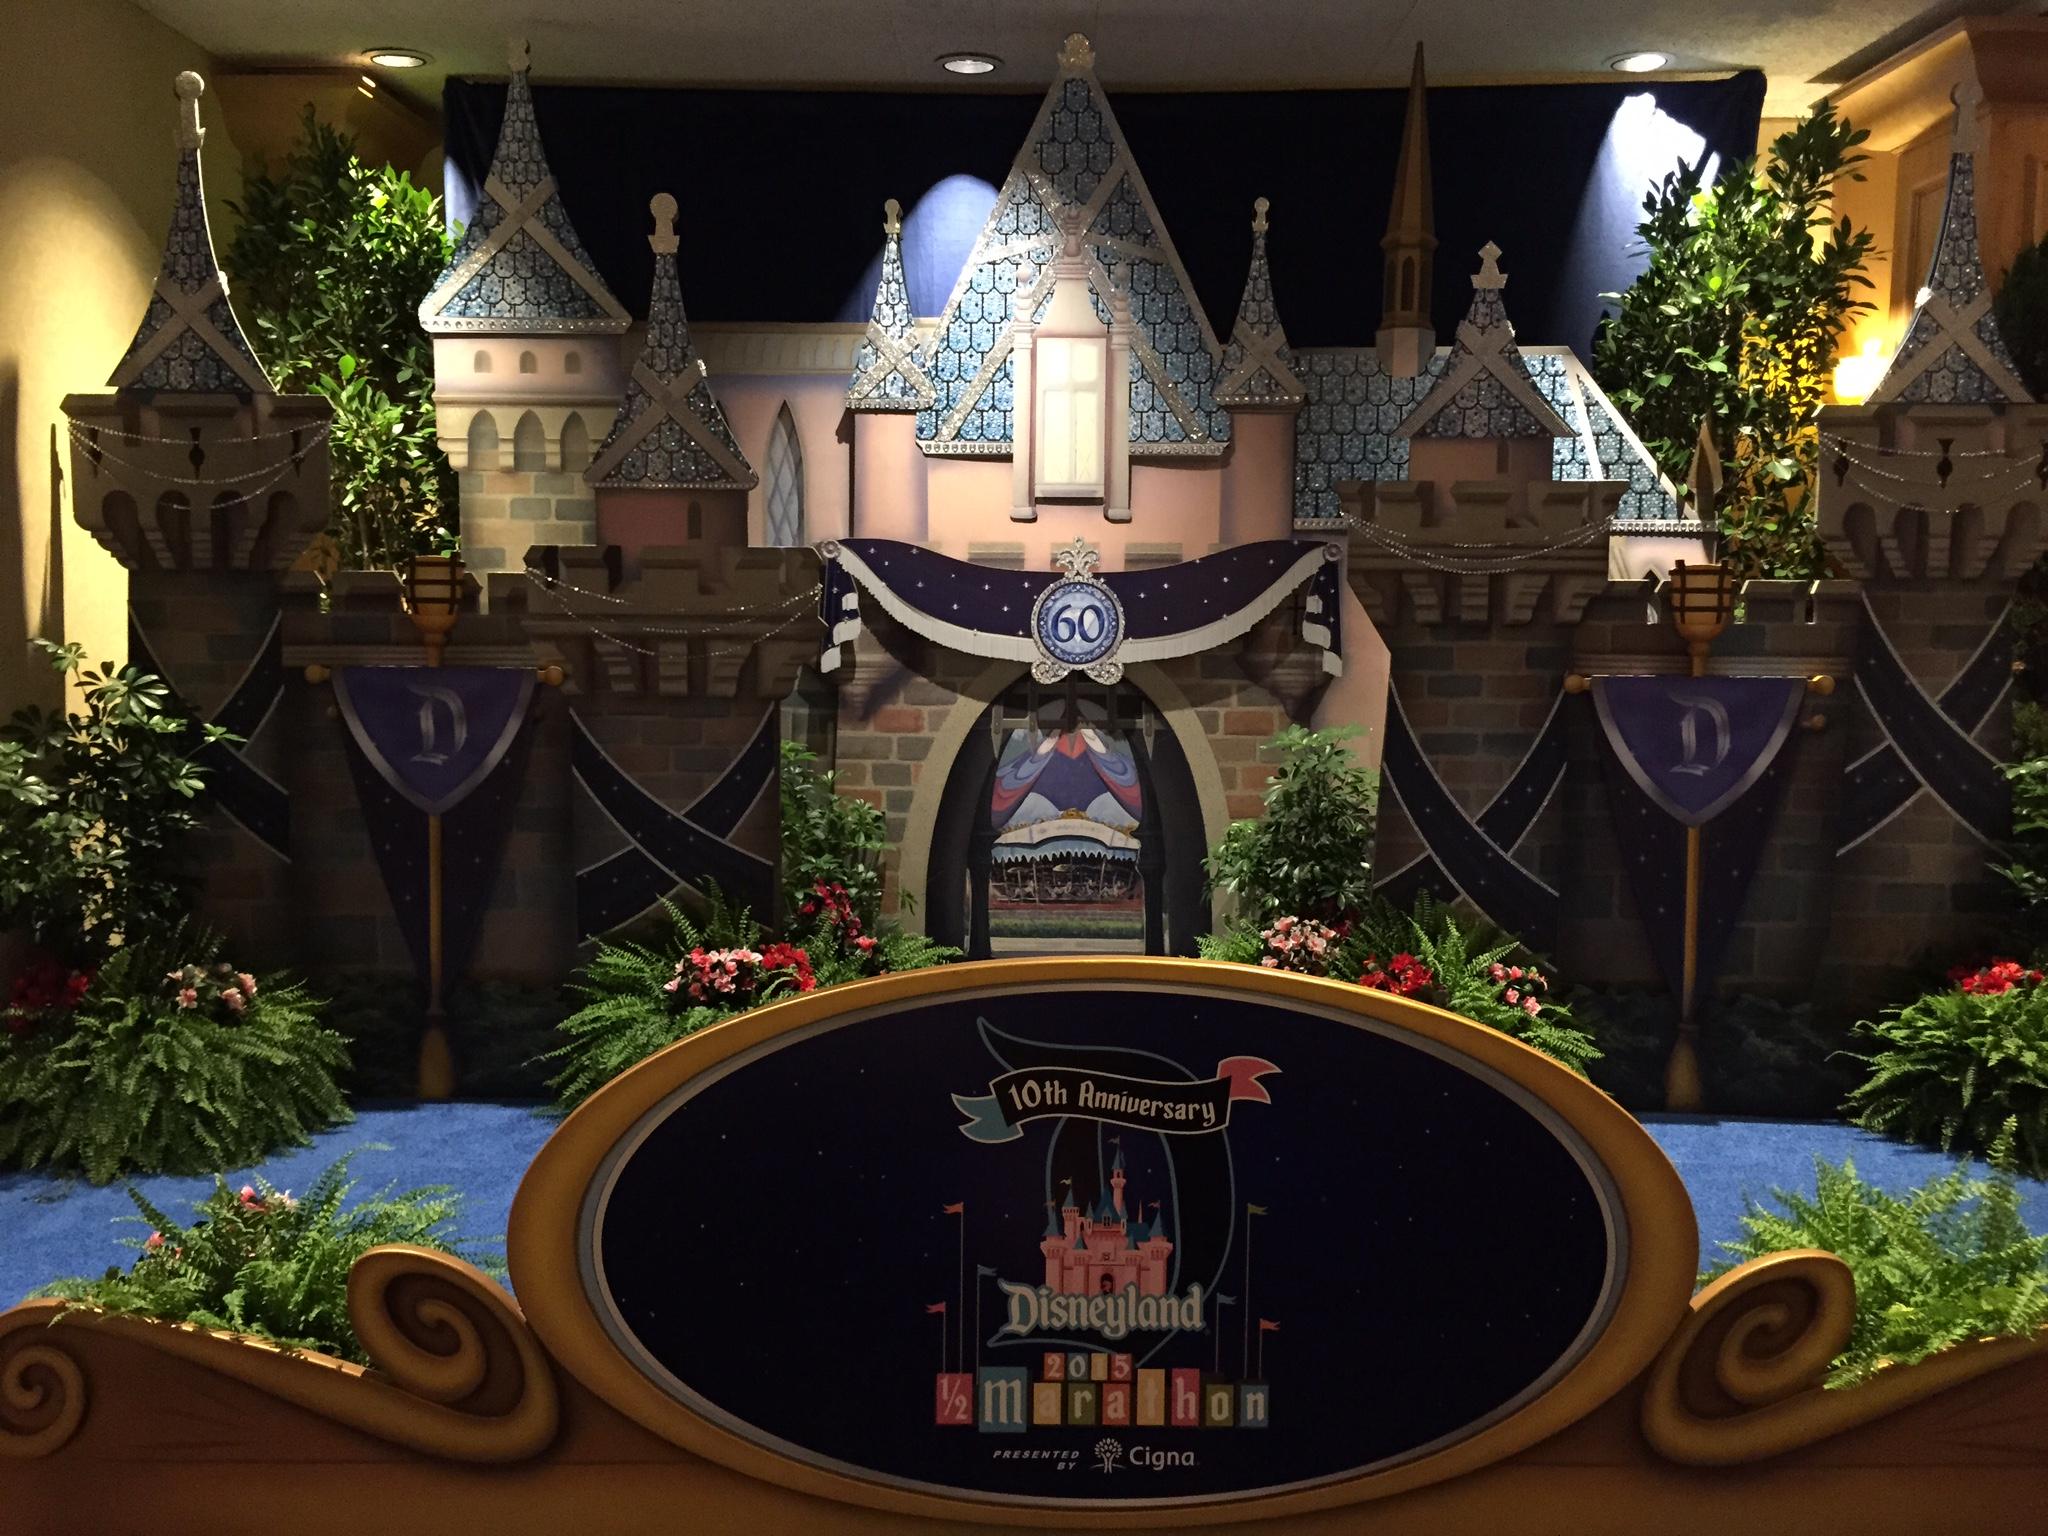 #Disneyland60 Diamond Celebration Bling Everywhere. Yes, please!